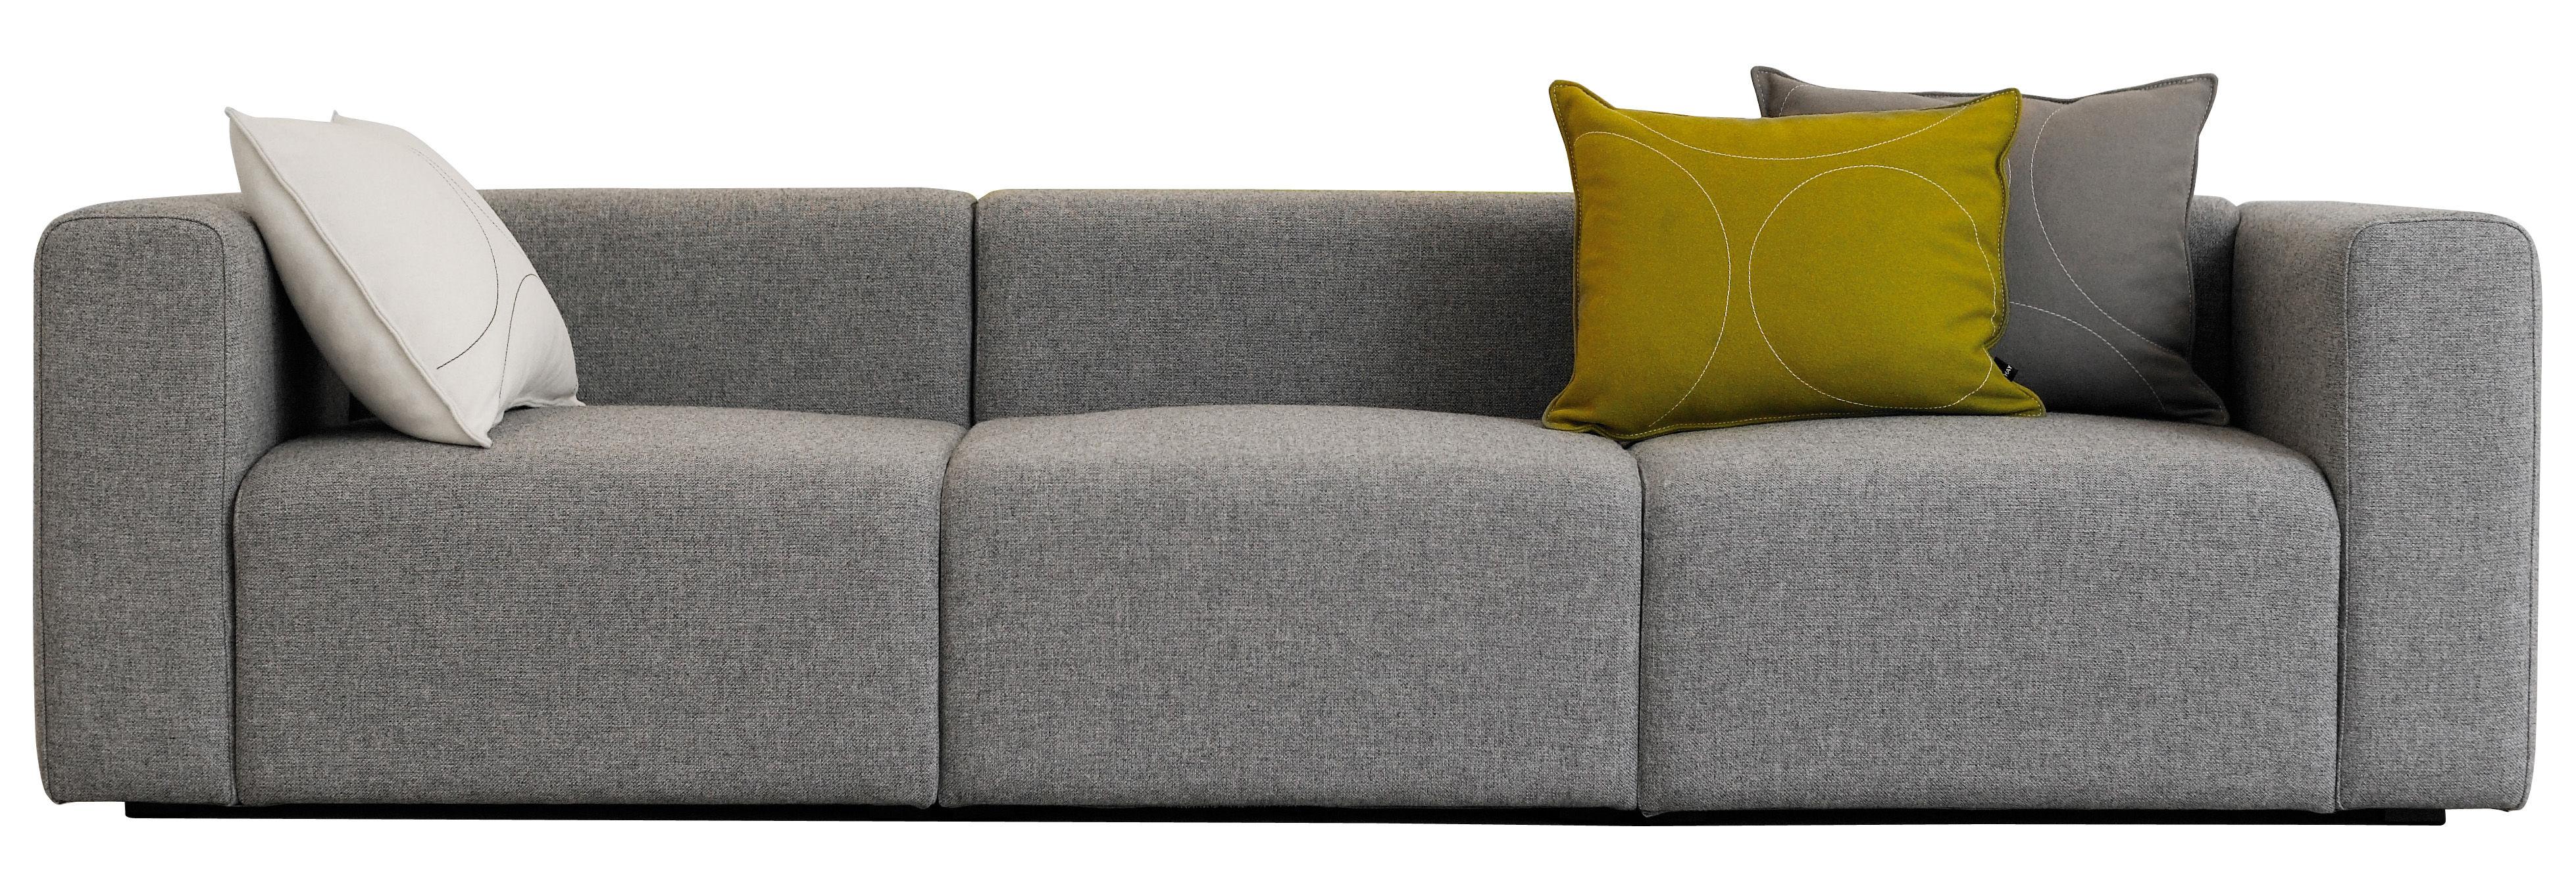 Furniture - Sofas - Mags Straight sofa - 3 seats / L 266 cm - Hallingdal fabric by Hay - Light grey - Fabric